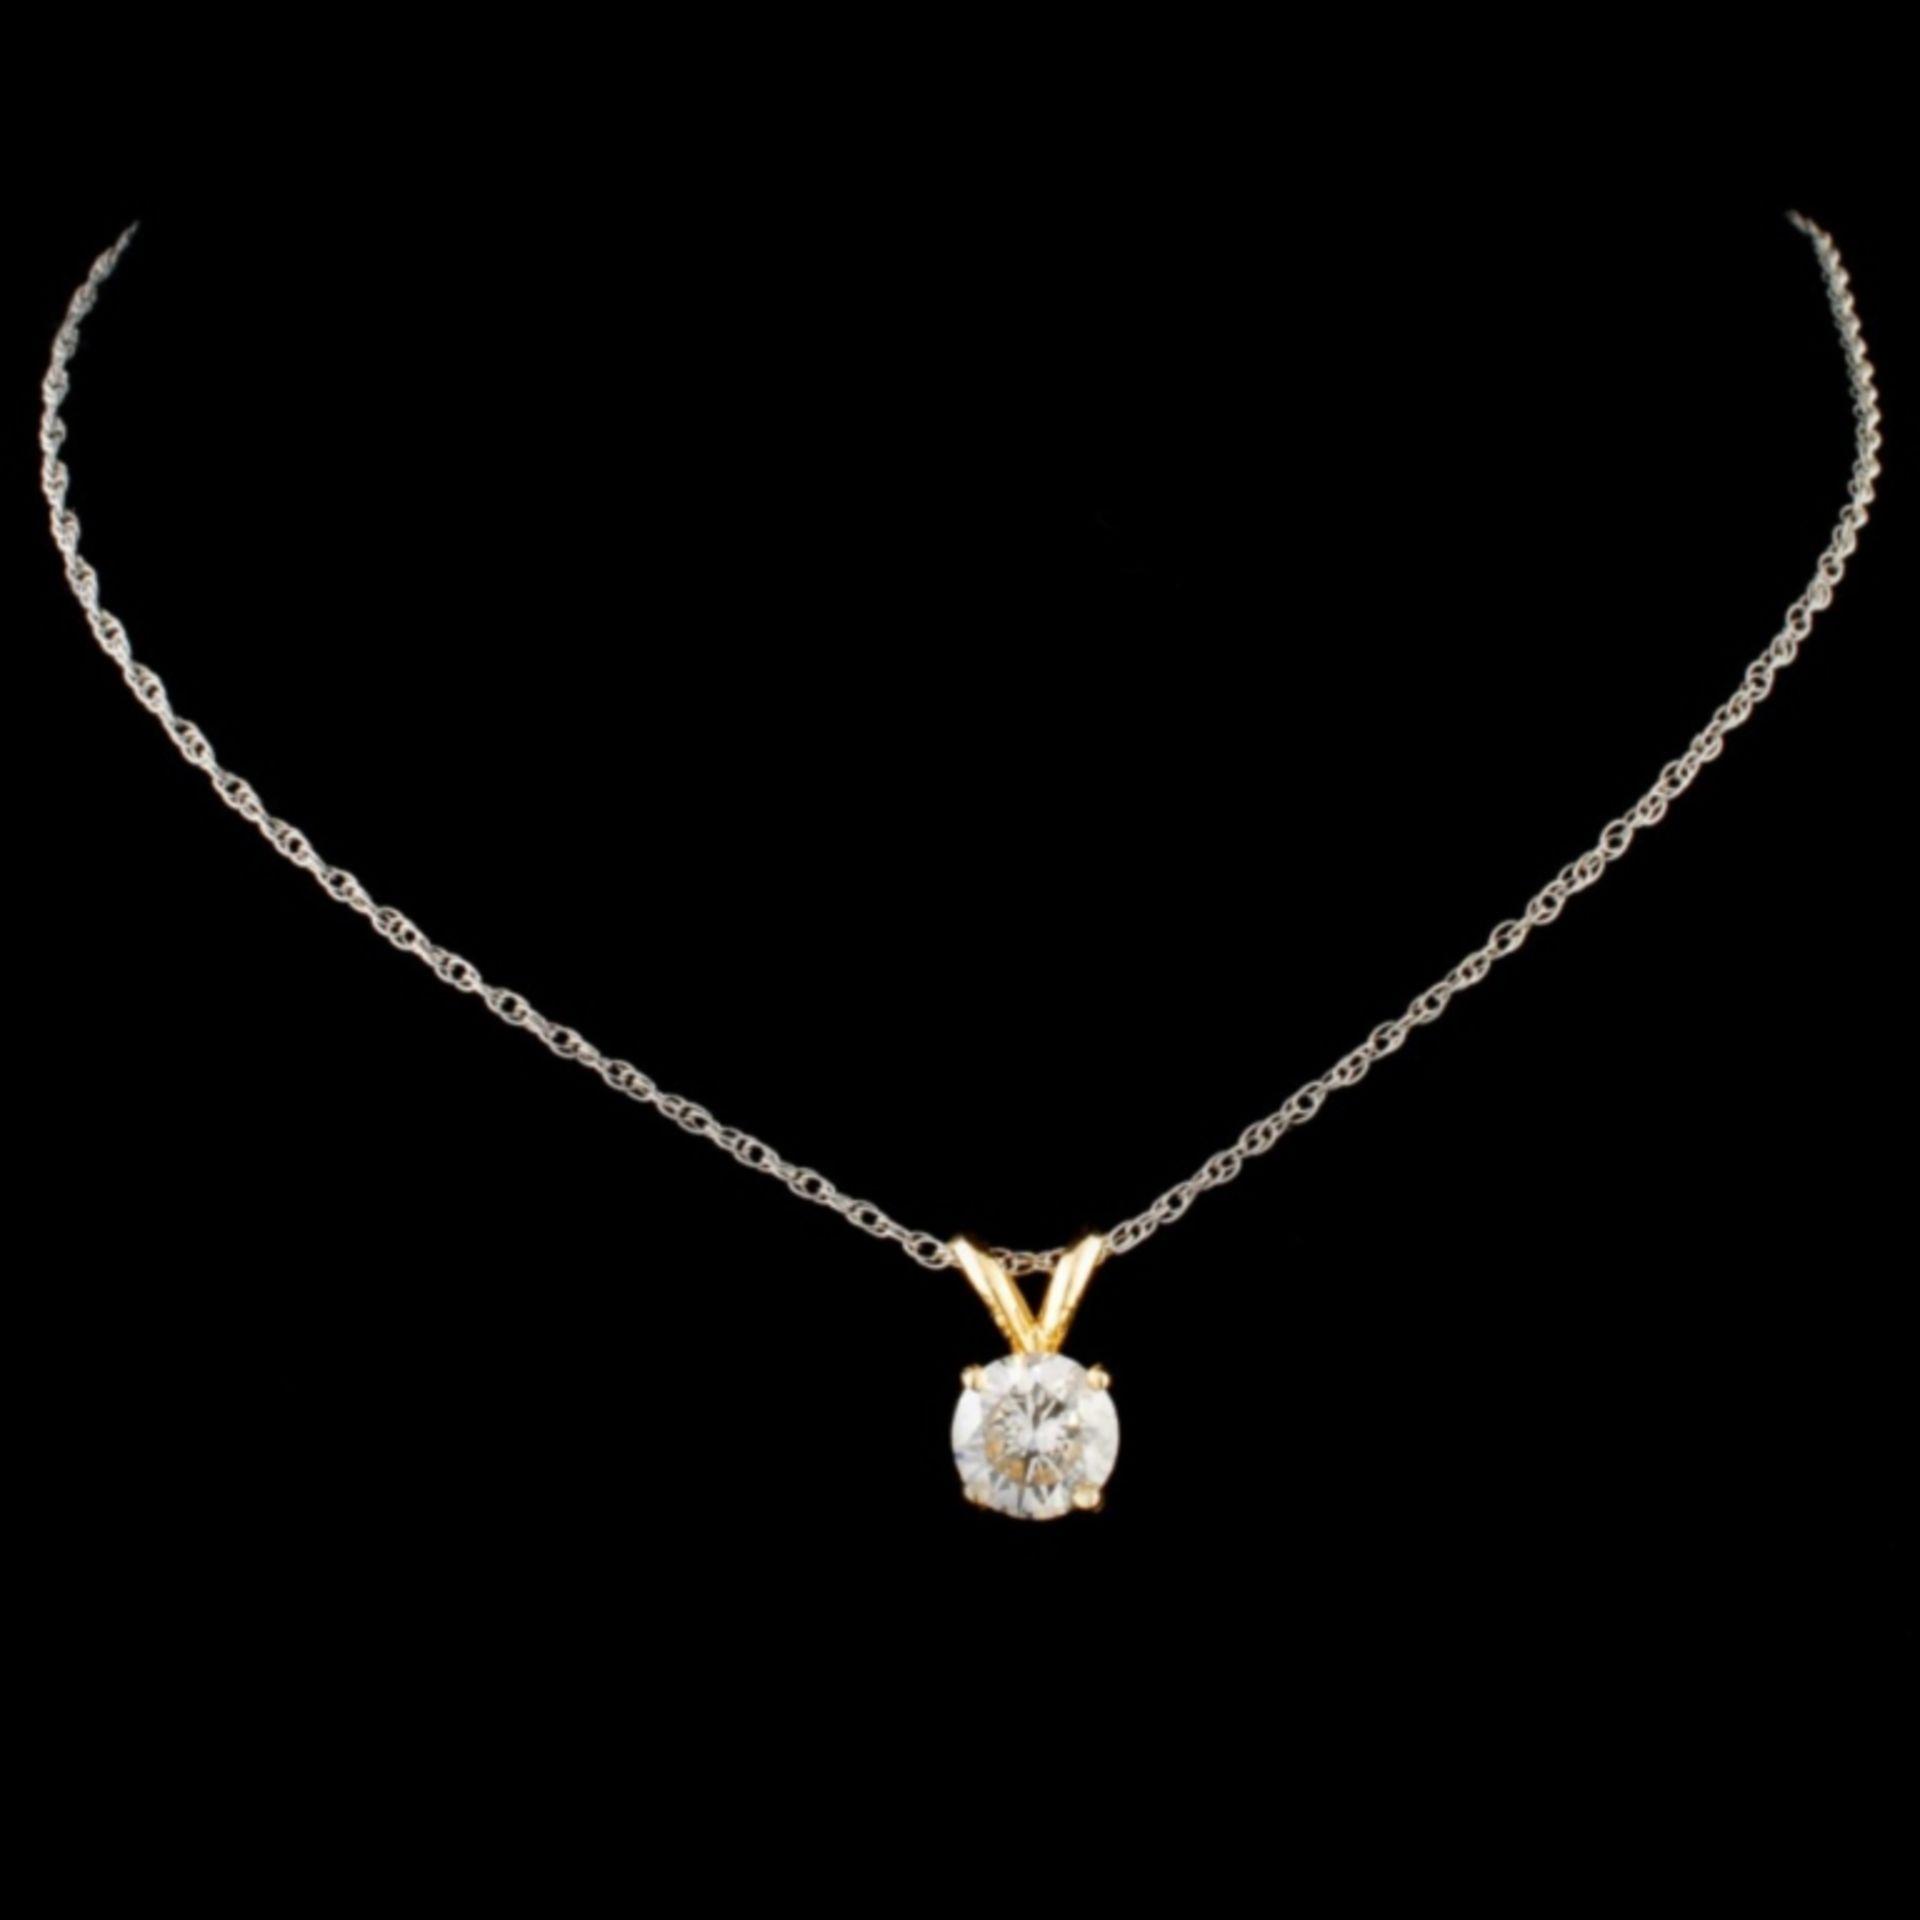 14K Gold 0.67ctw Diamond Pendant - Image 2 of 3